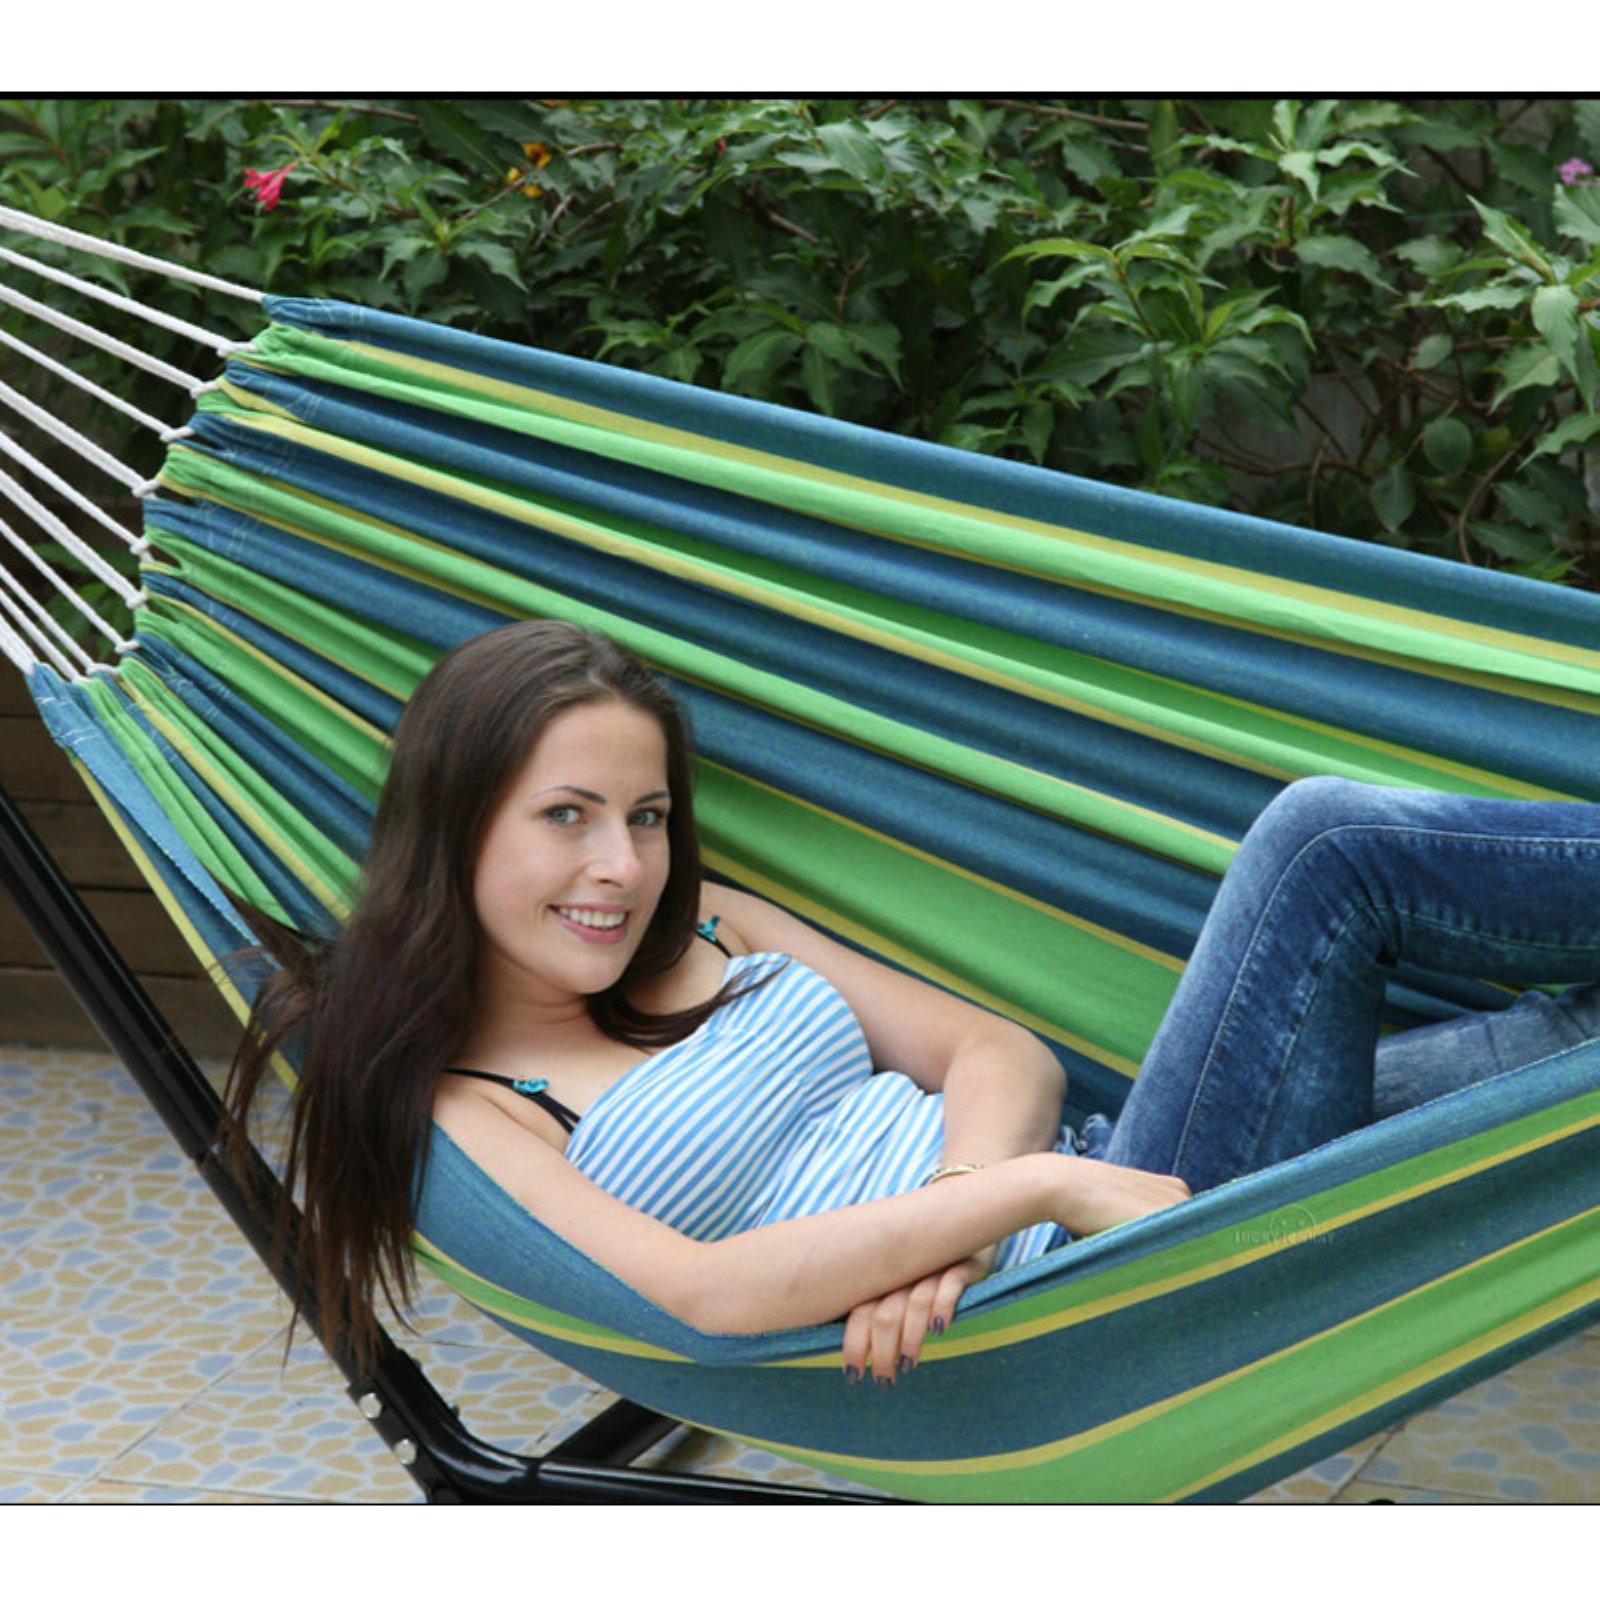 Brazilian Hammock in a Bag (Green Teal Stripe) by Smart Living Home & Gardern